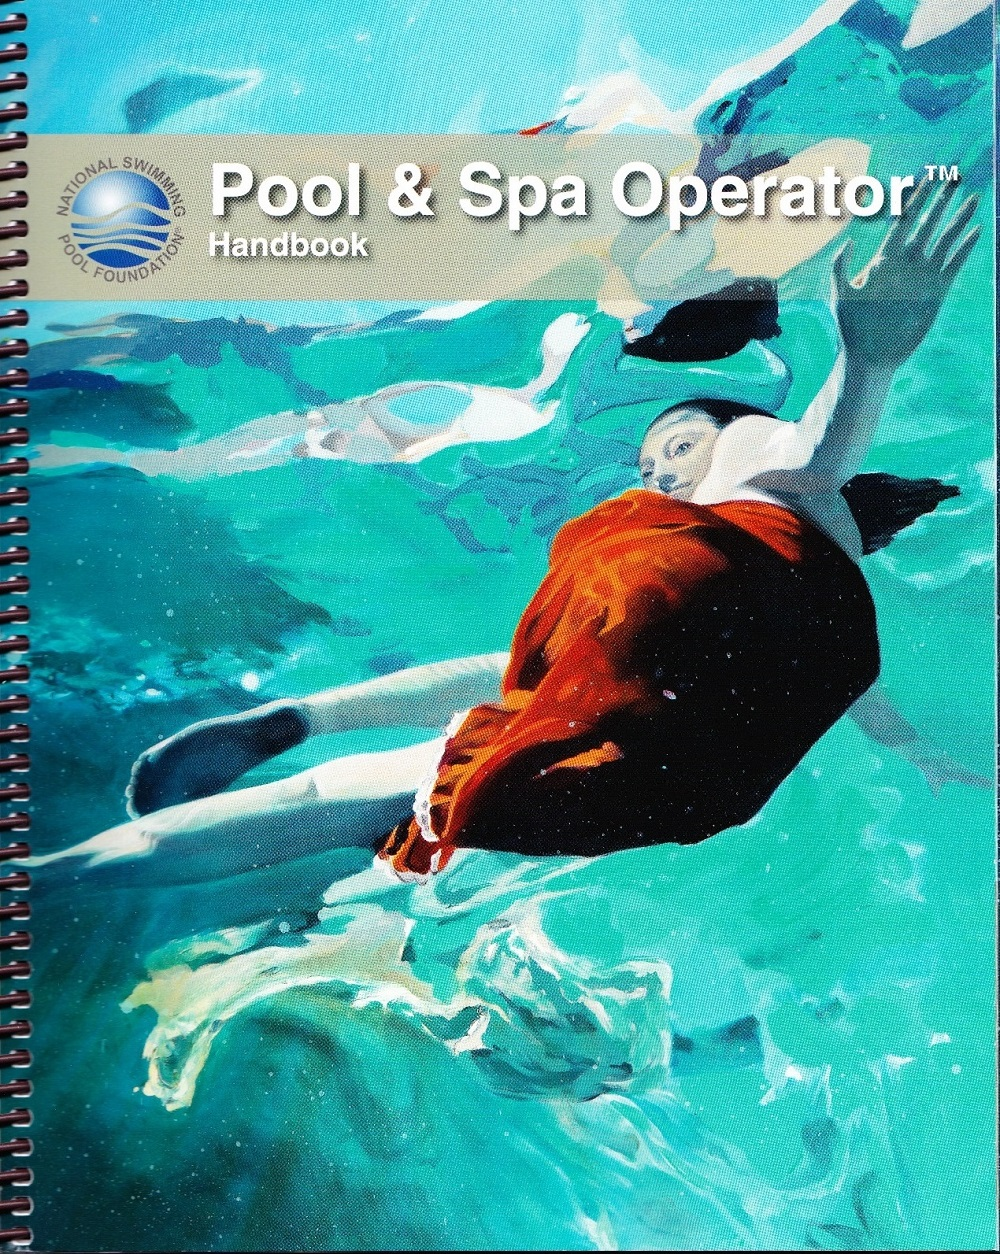 Florida Swimming Pool Spa Servicing Contractor